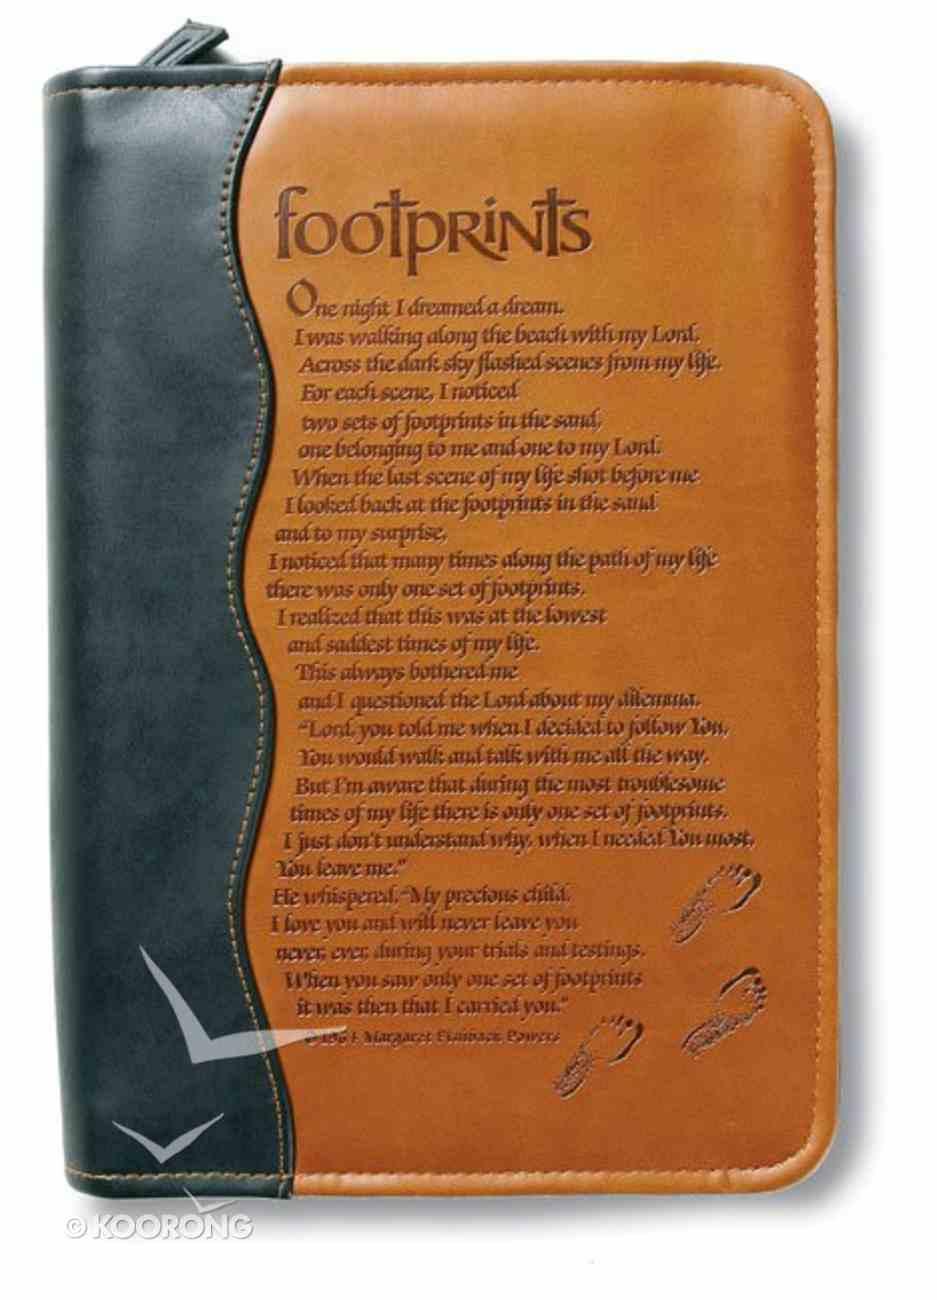 Bible Cover Footprints Duo-Tone Black/Tan Medium Bible Cover